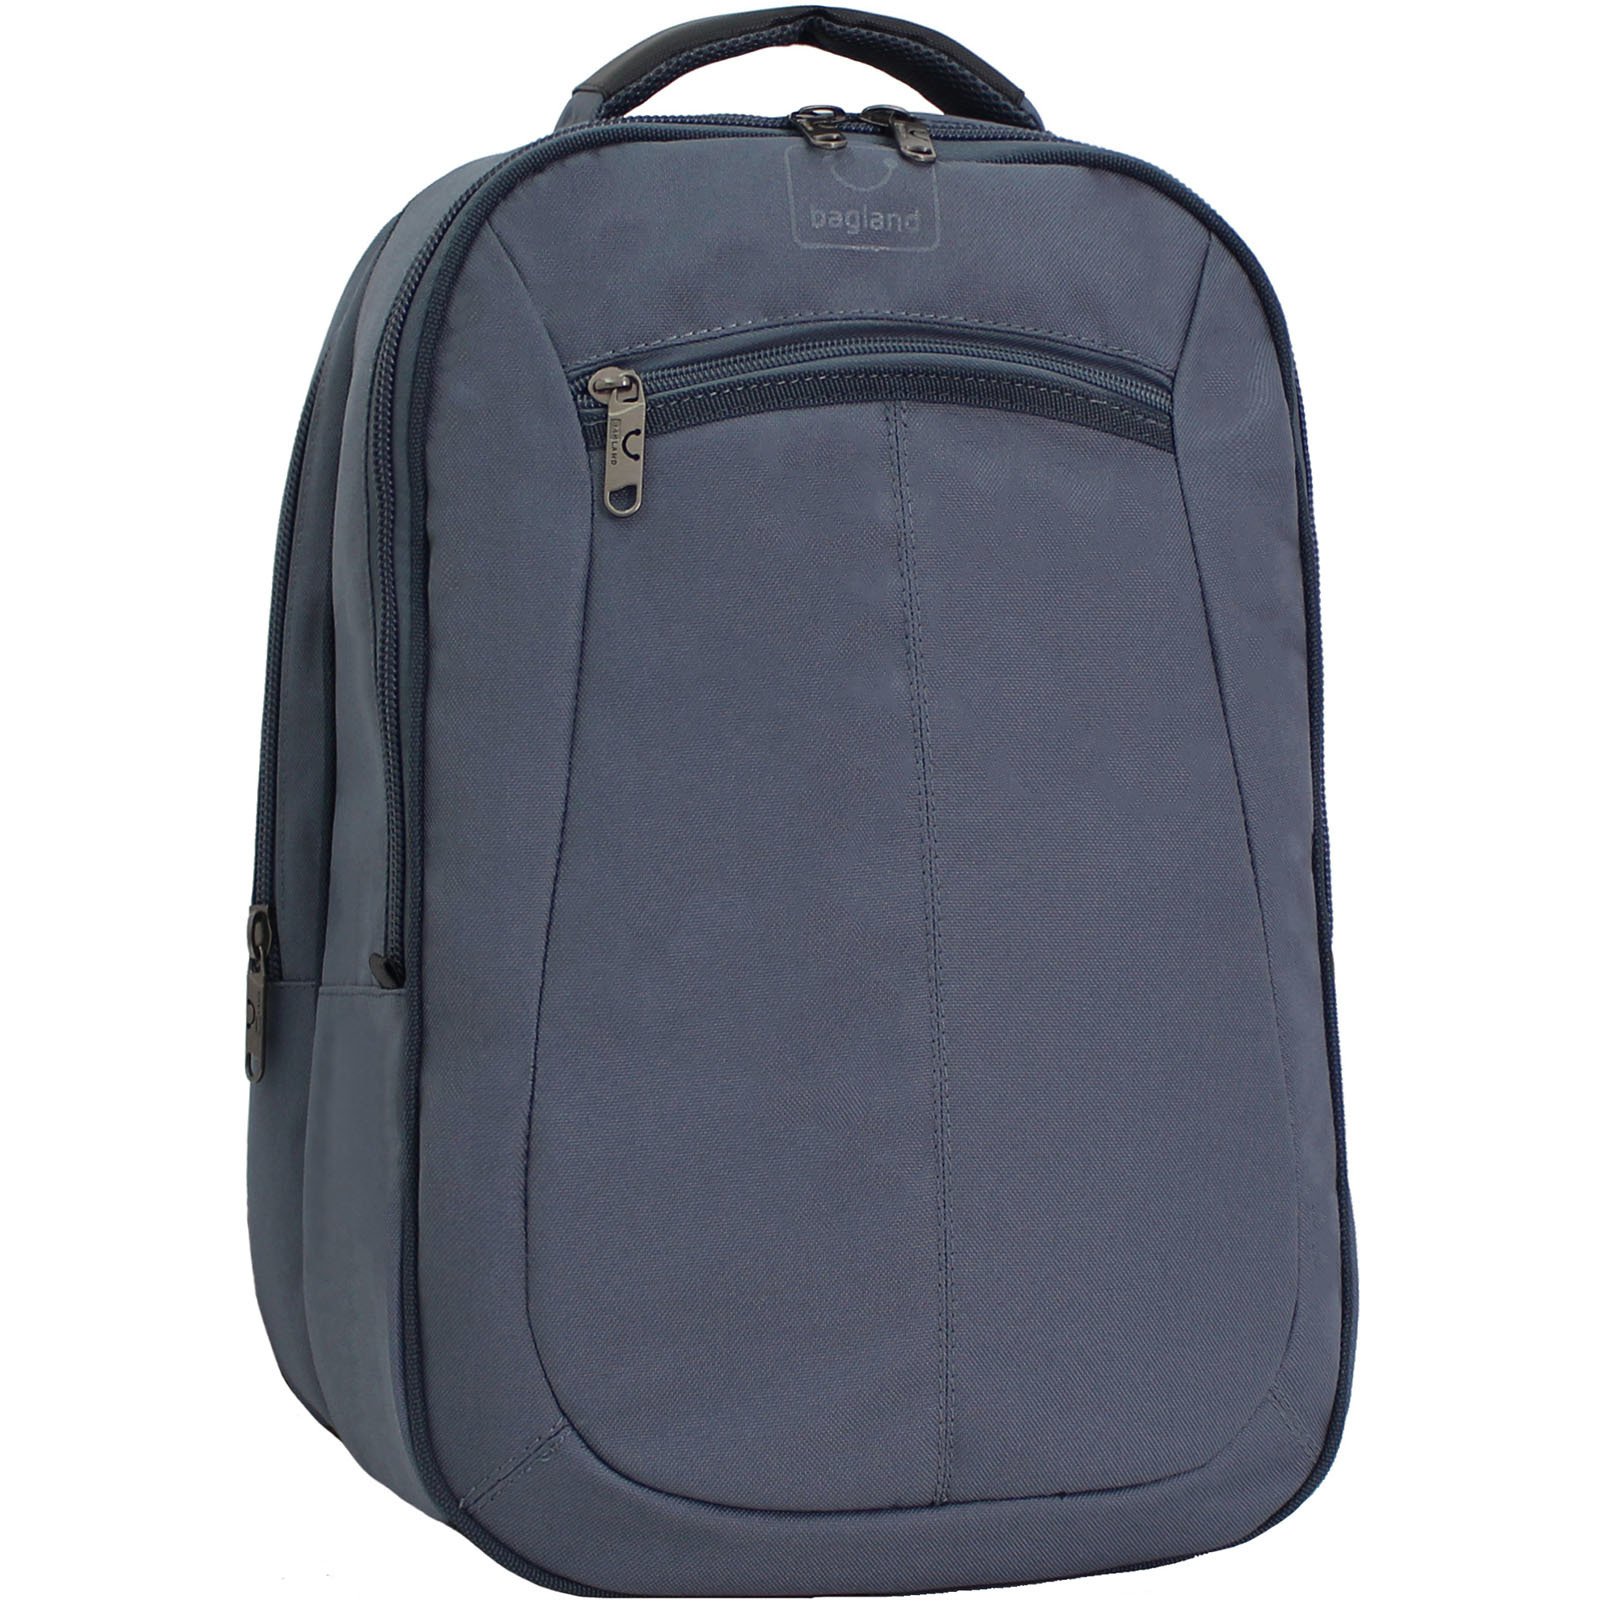 Рюкзаки для ноутбука Рюкзак для ноутбука Bagland Рюкзак под ноутбук 536 22 л. Темно серый (0053666) IMG_9914.JPG